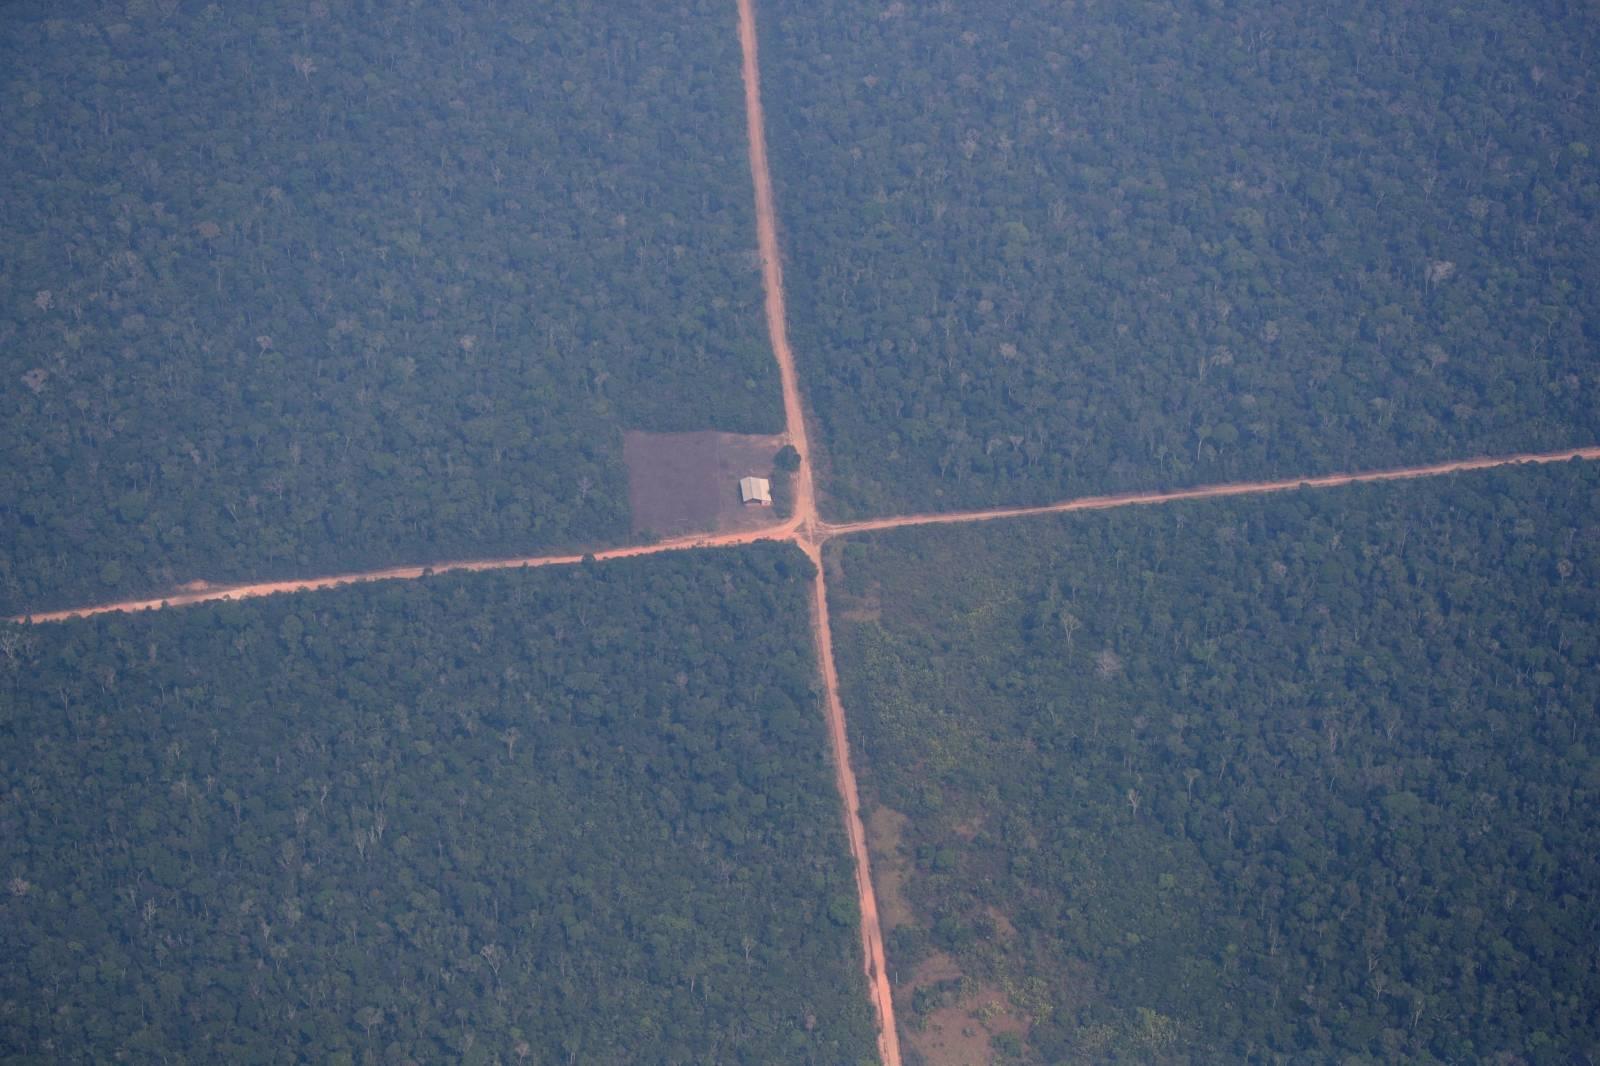 An aerial view of the Amazon near Humaita